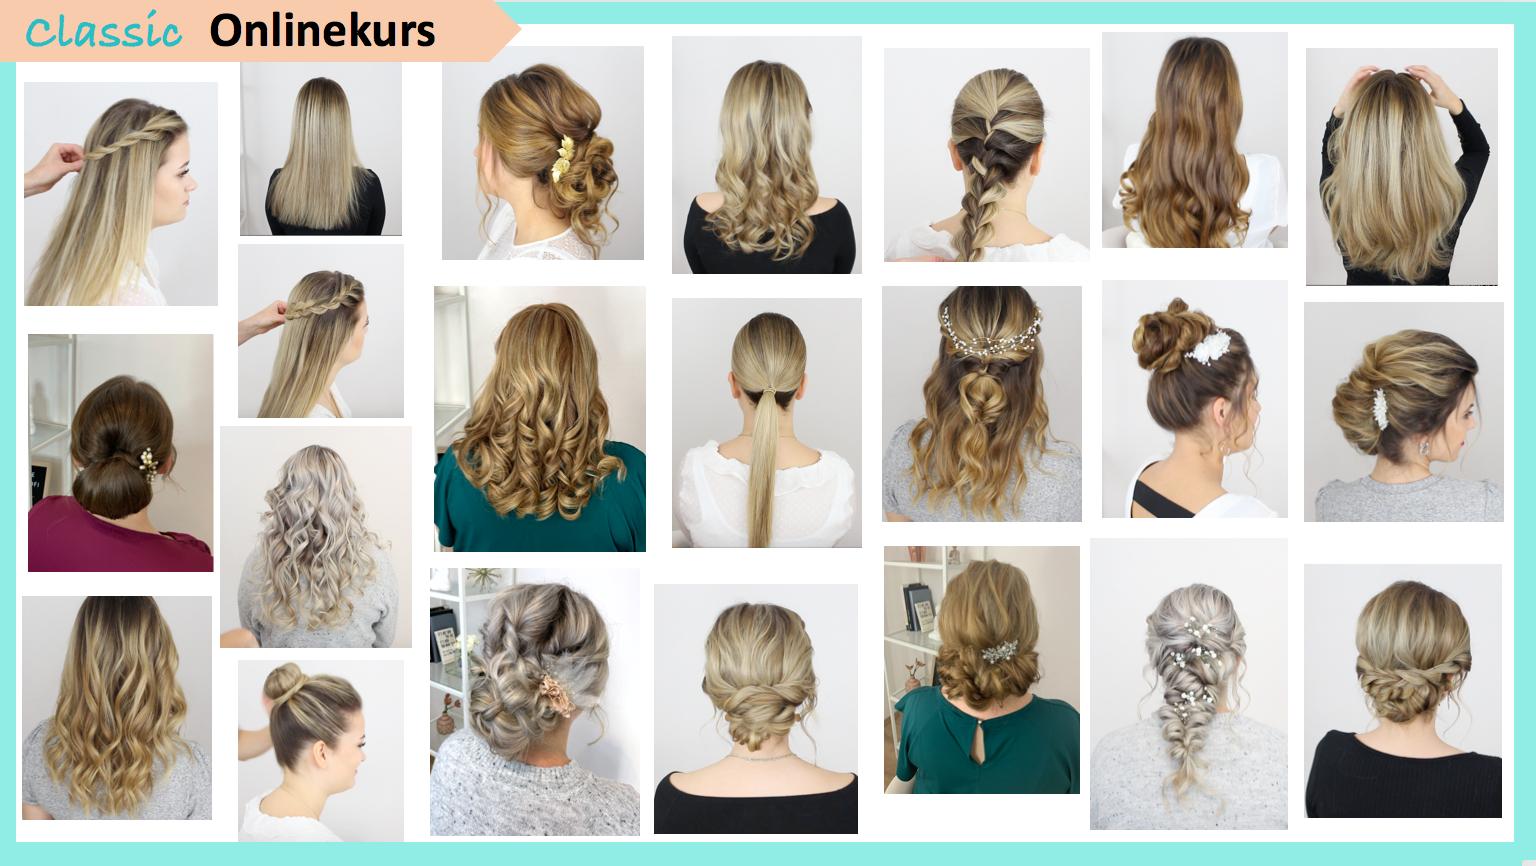 Classic Hairstyling Kurs